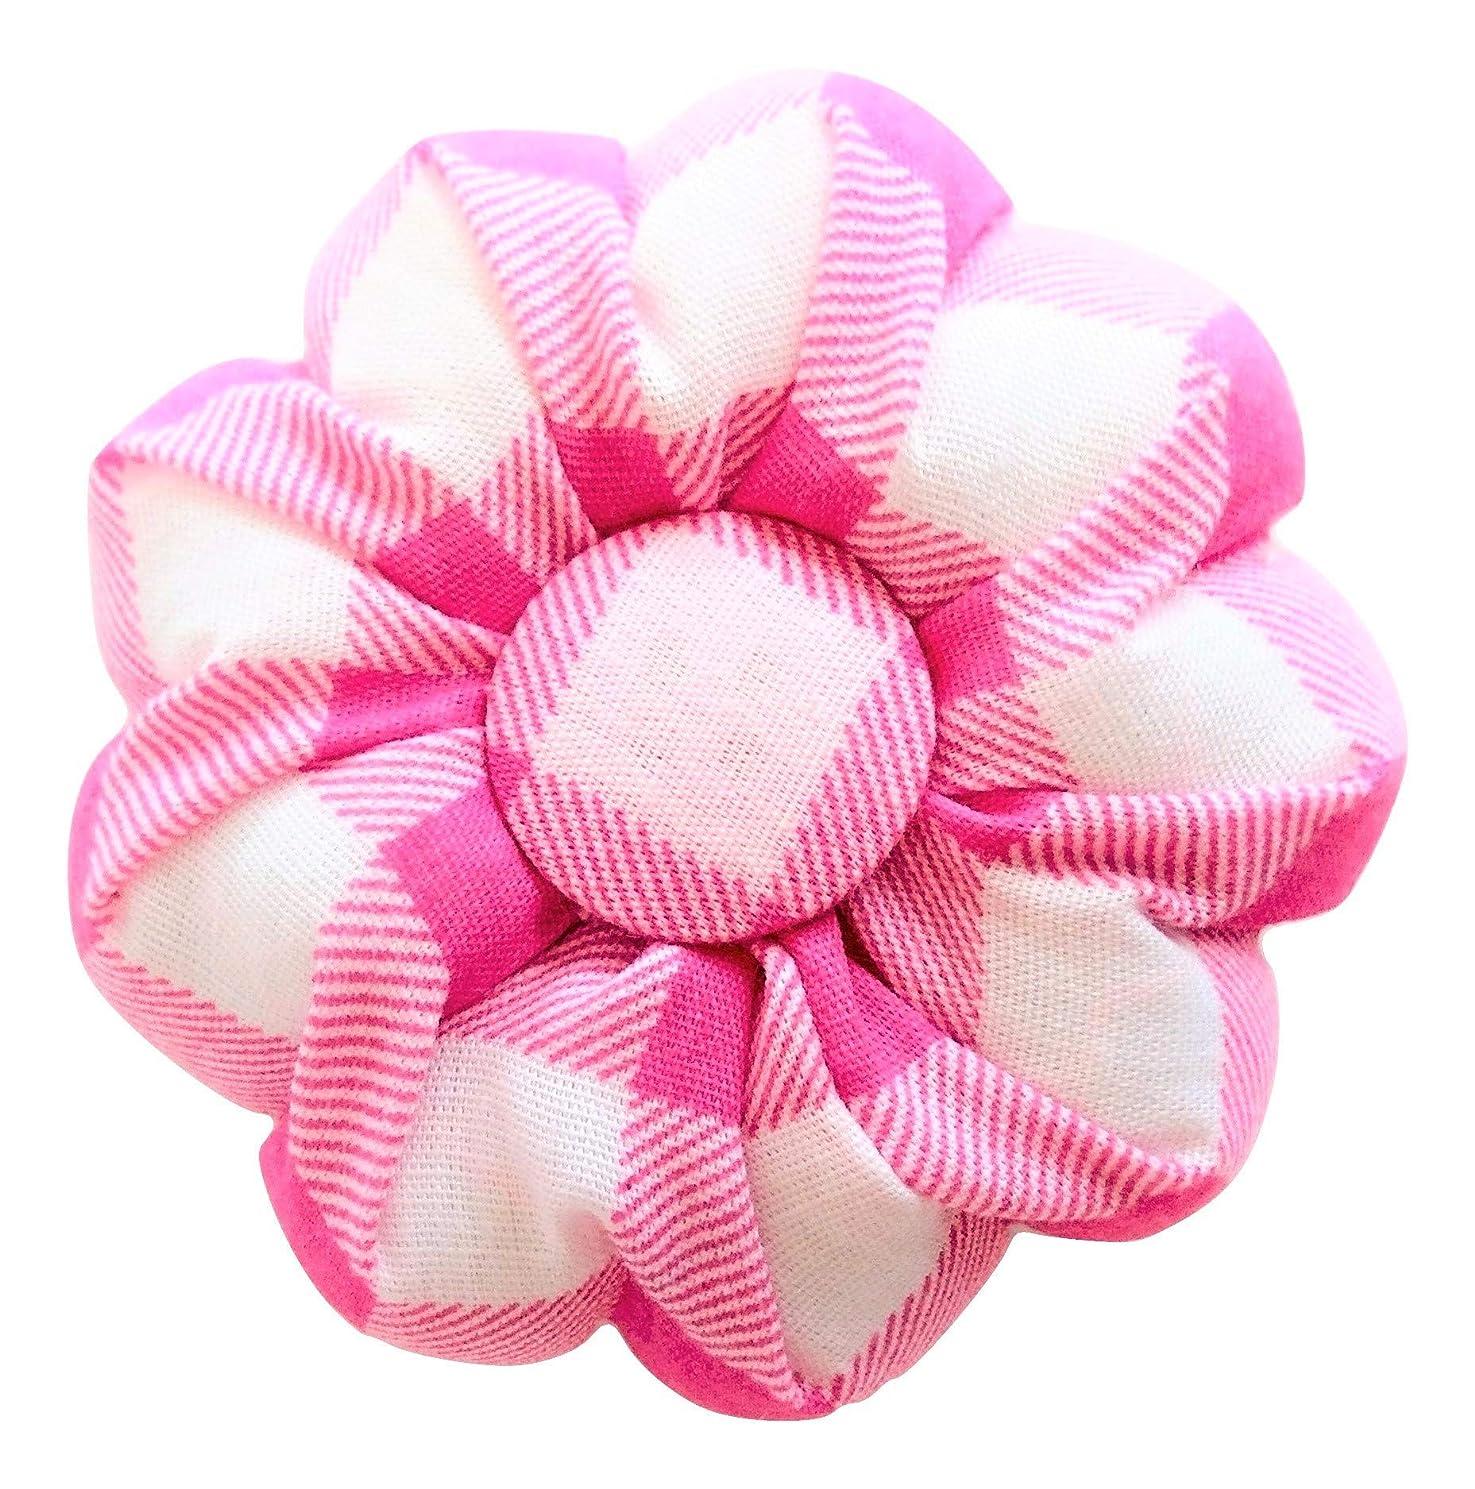 Pink Pin Needle Cushion Sewing White Buffalo Plaid Tartan Cute Small Size Pumpkin Sewing Pincushions Sweet Lovely Girl Women Gift Craft Handmade Quilting